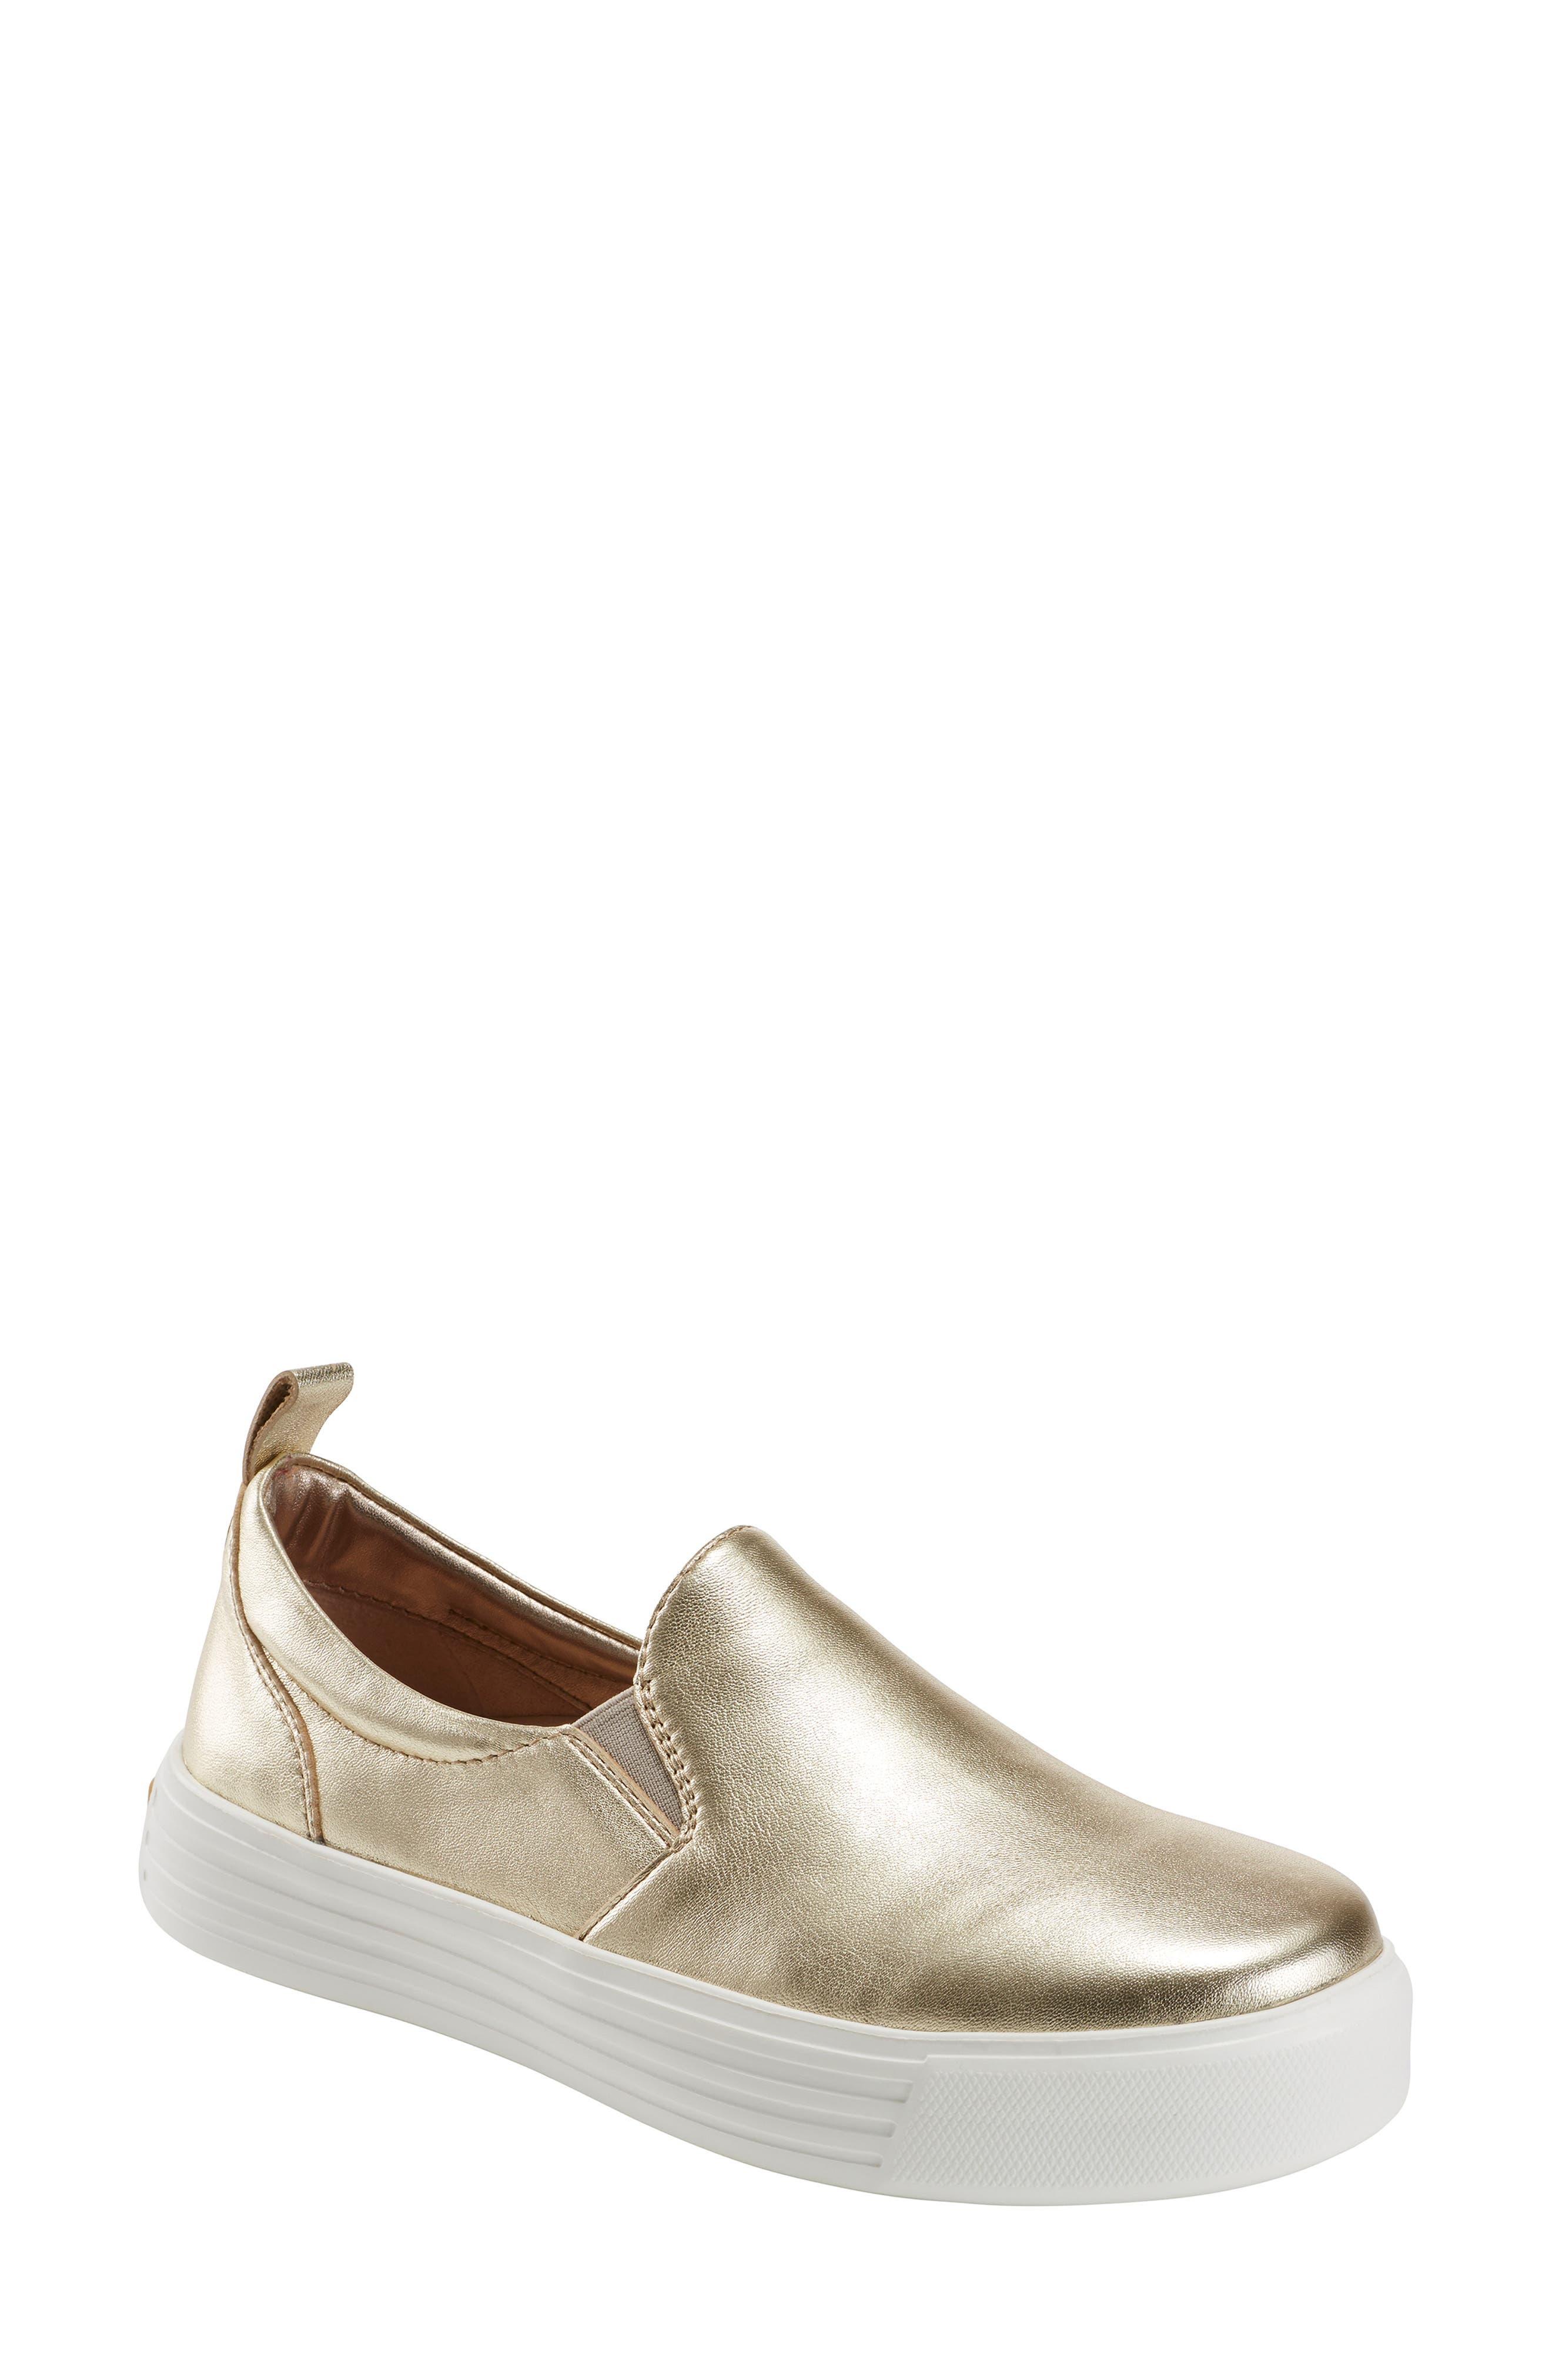 Earth Clove Sneaker, Metallic